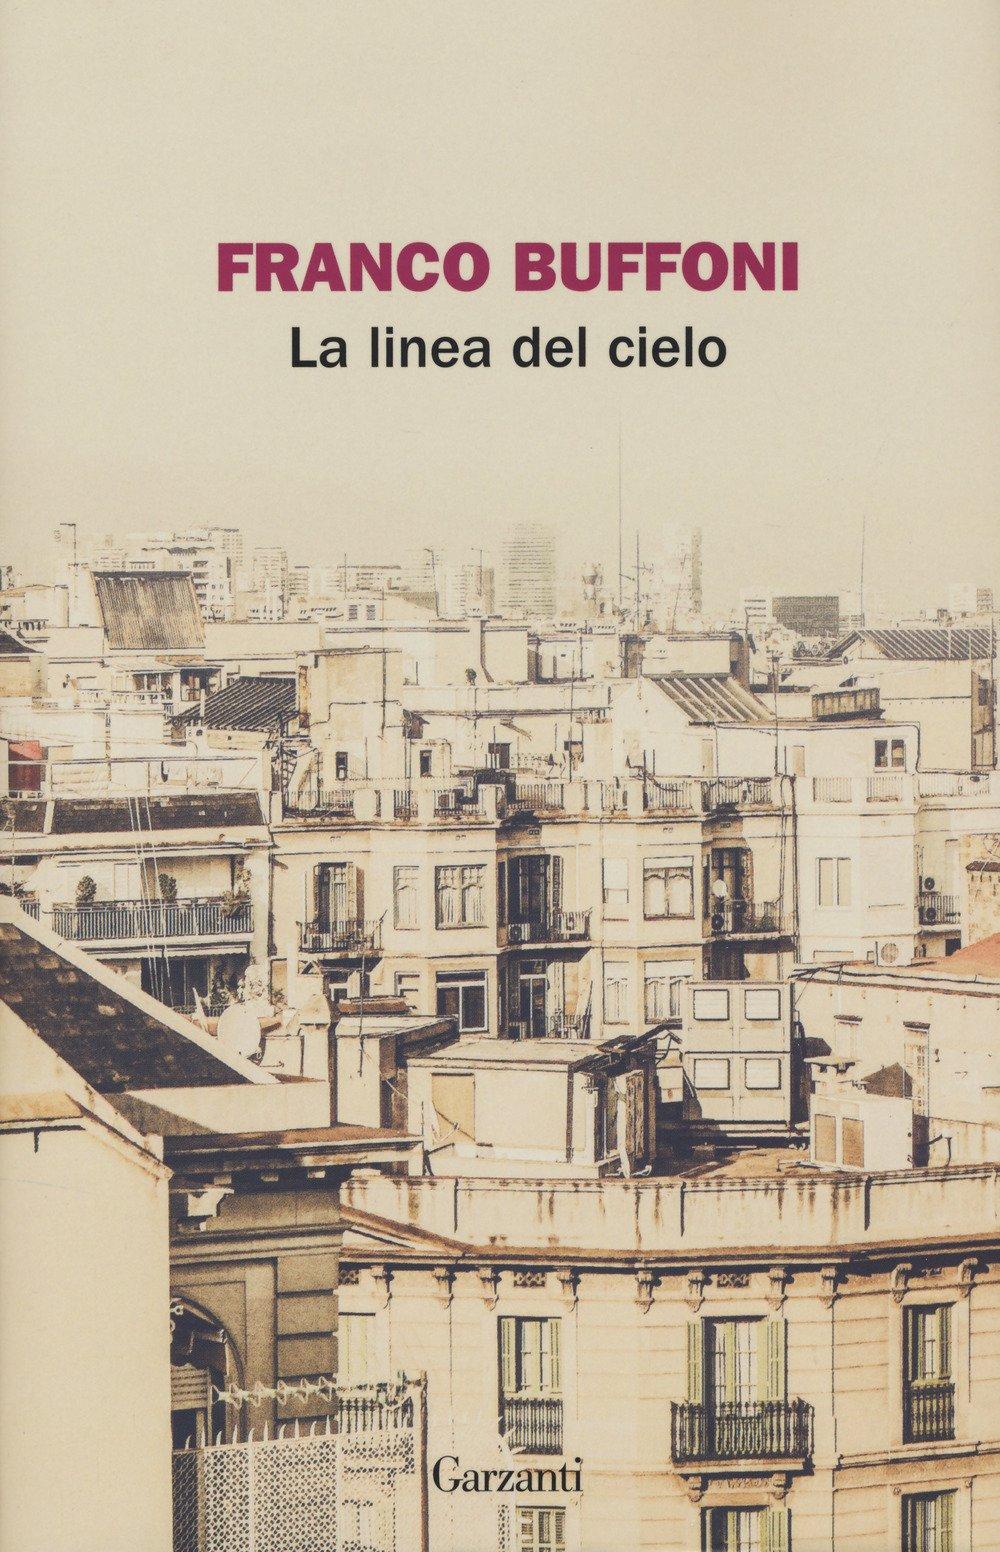 La linea del cielo – Franco Buffoni